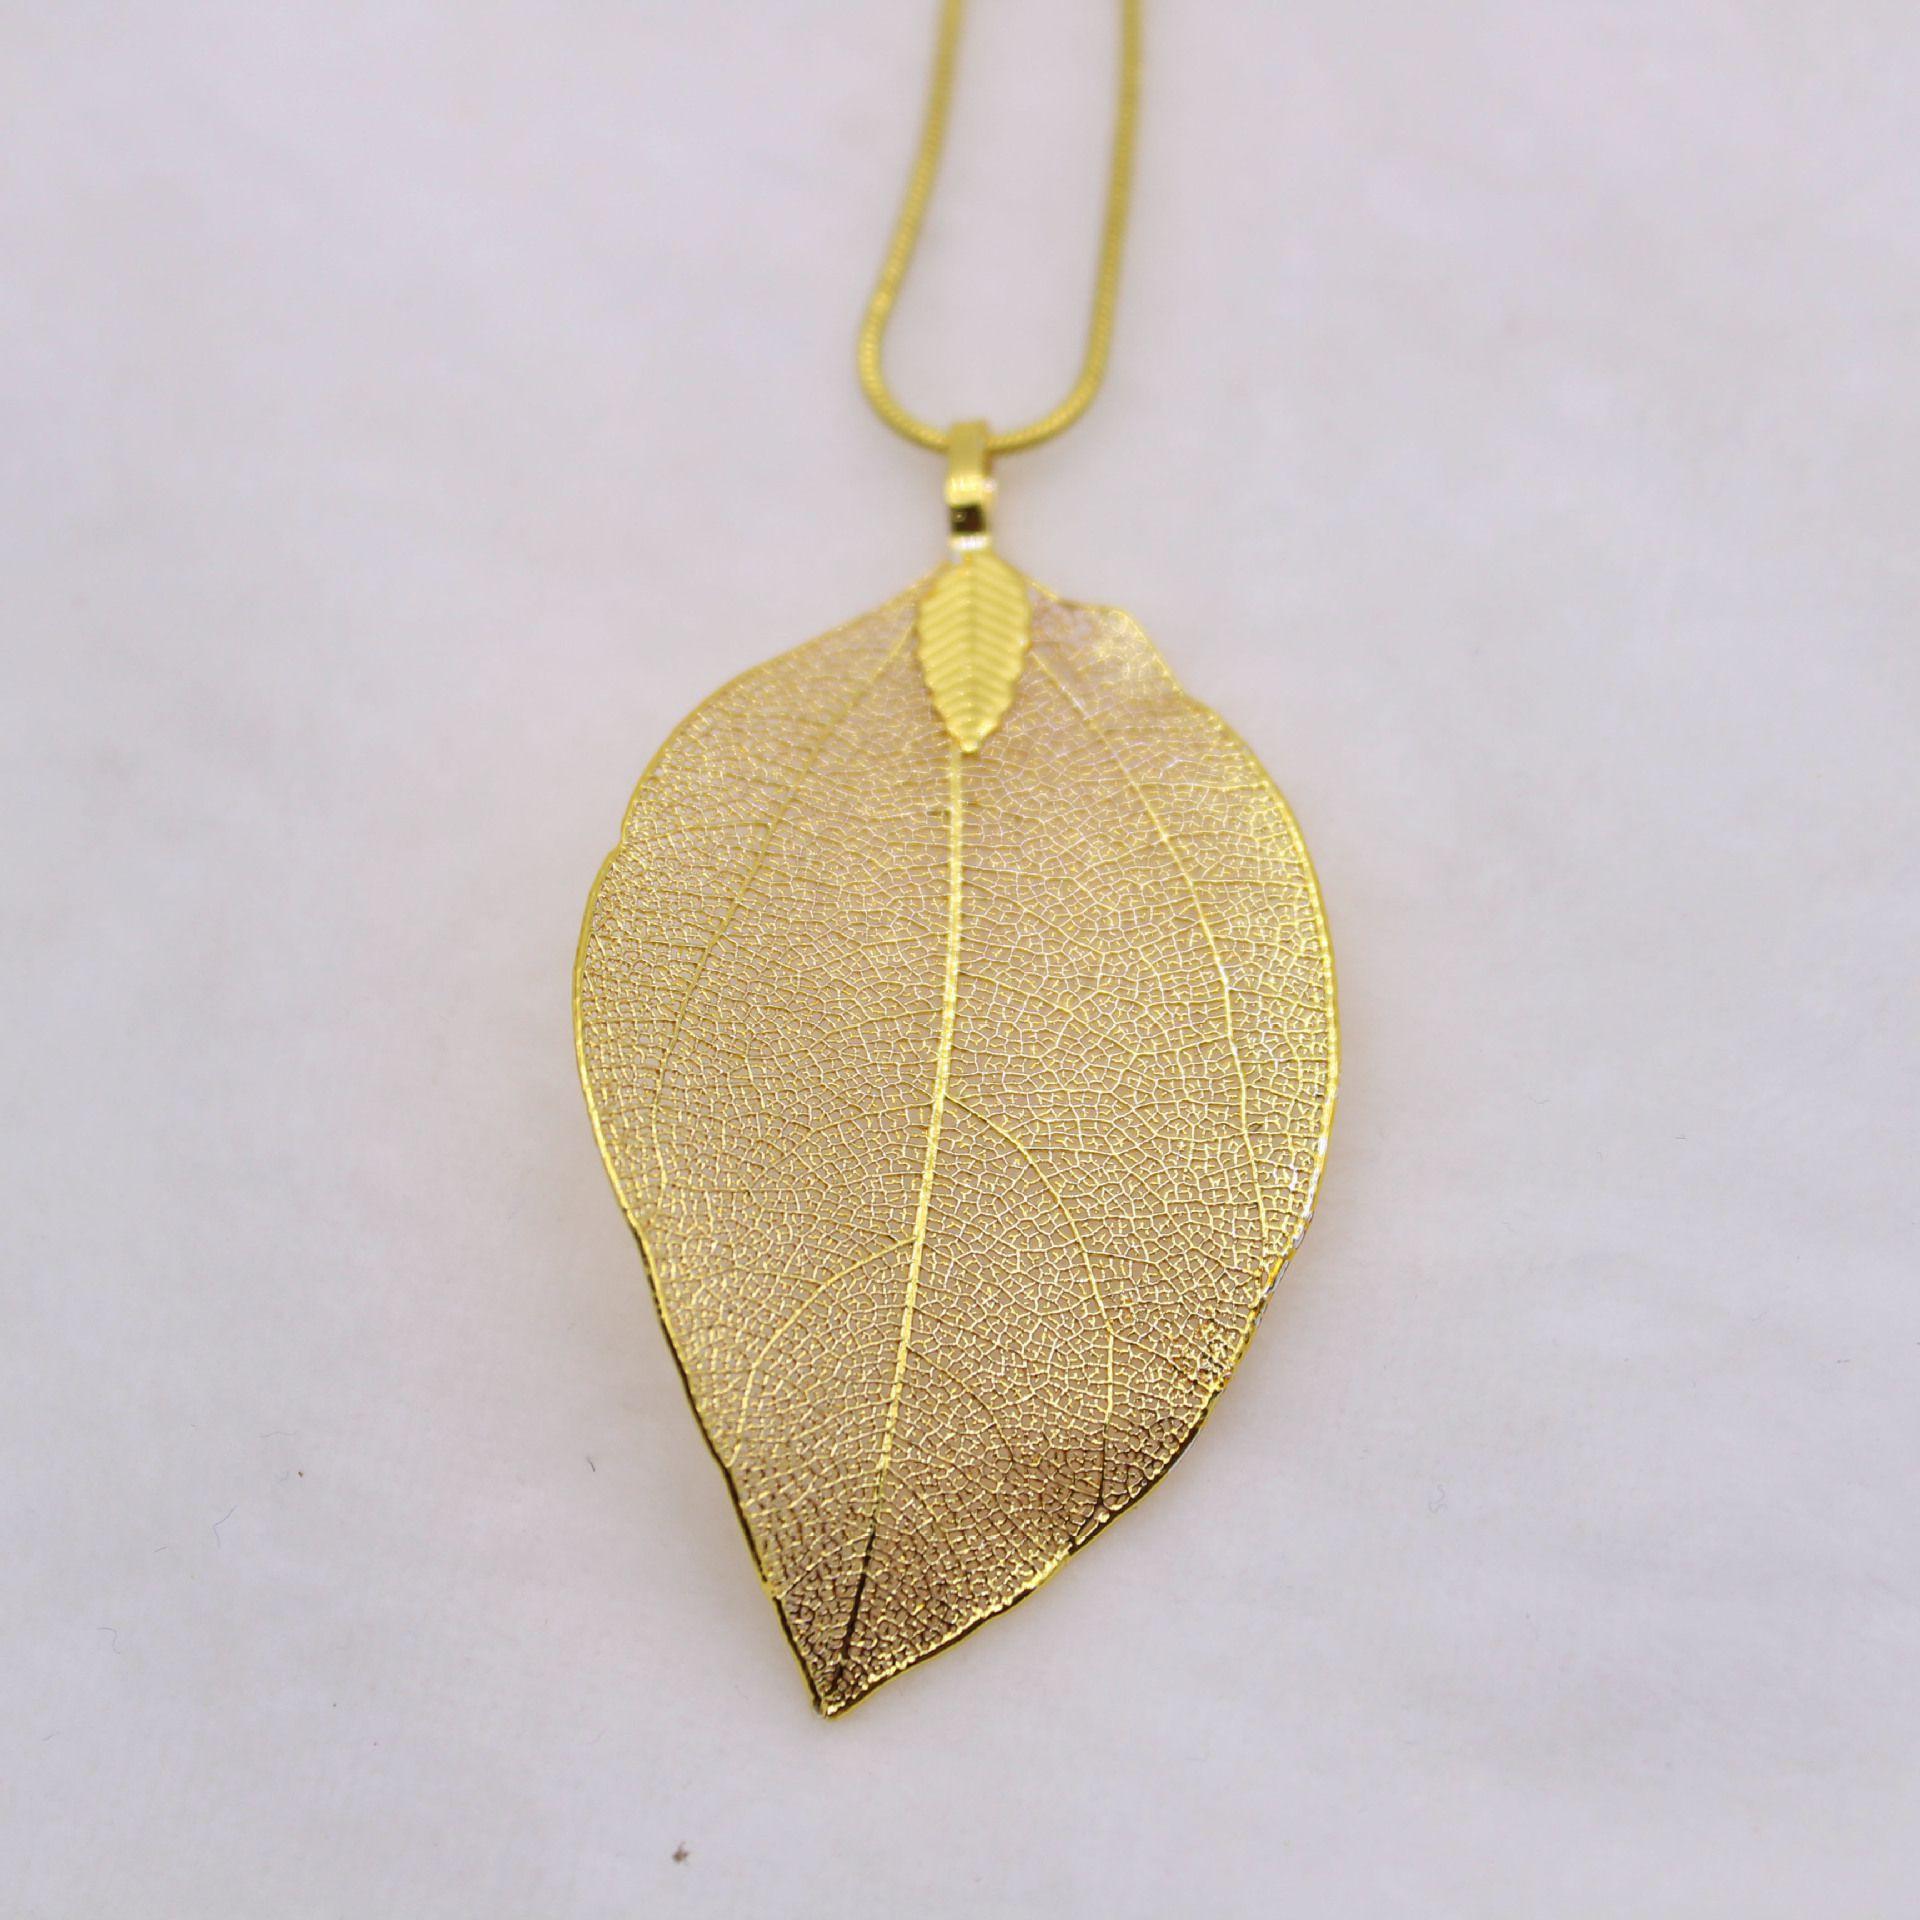 Kamalife Fashion Leaf Gold Necklace Jewelry Accessories